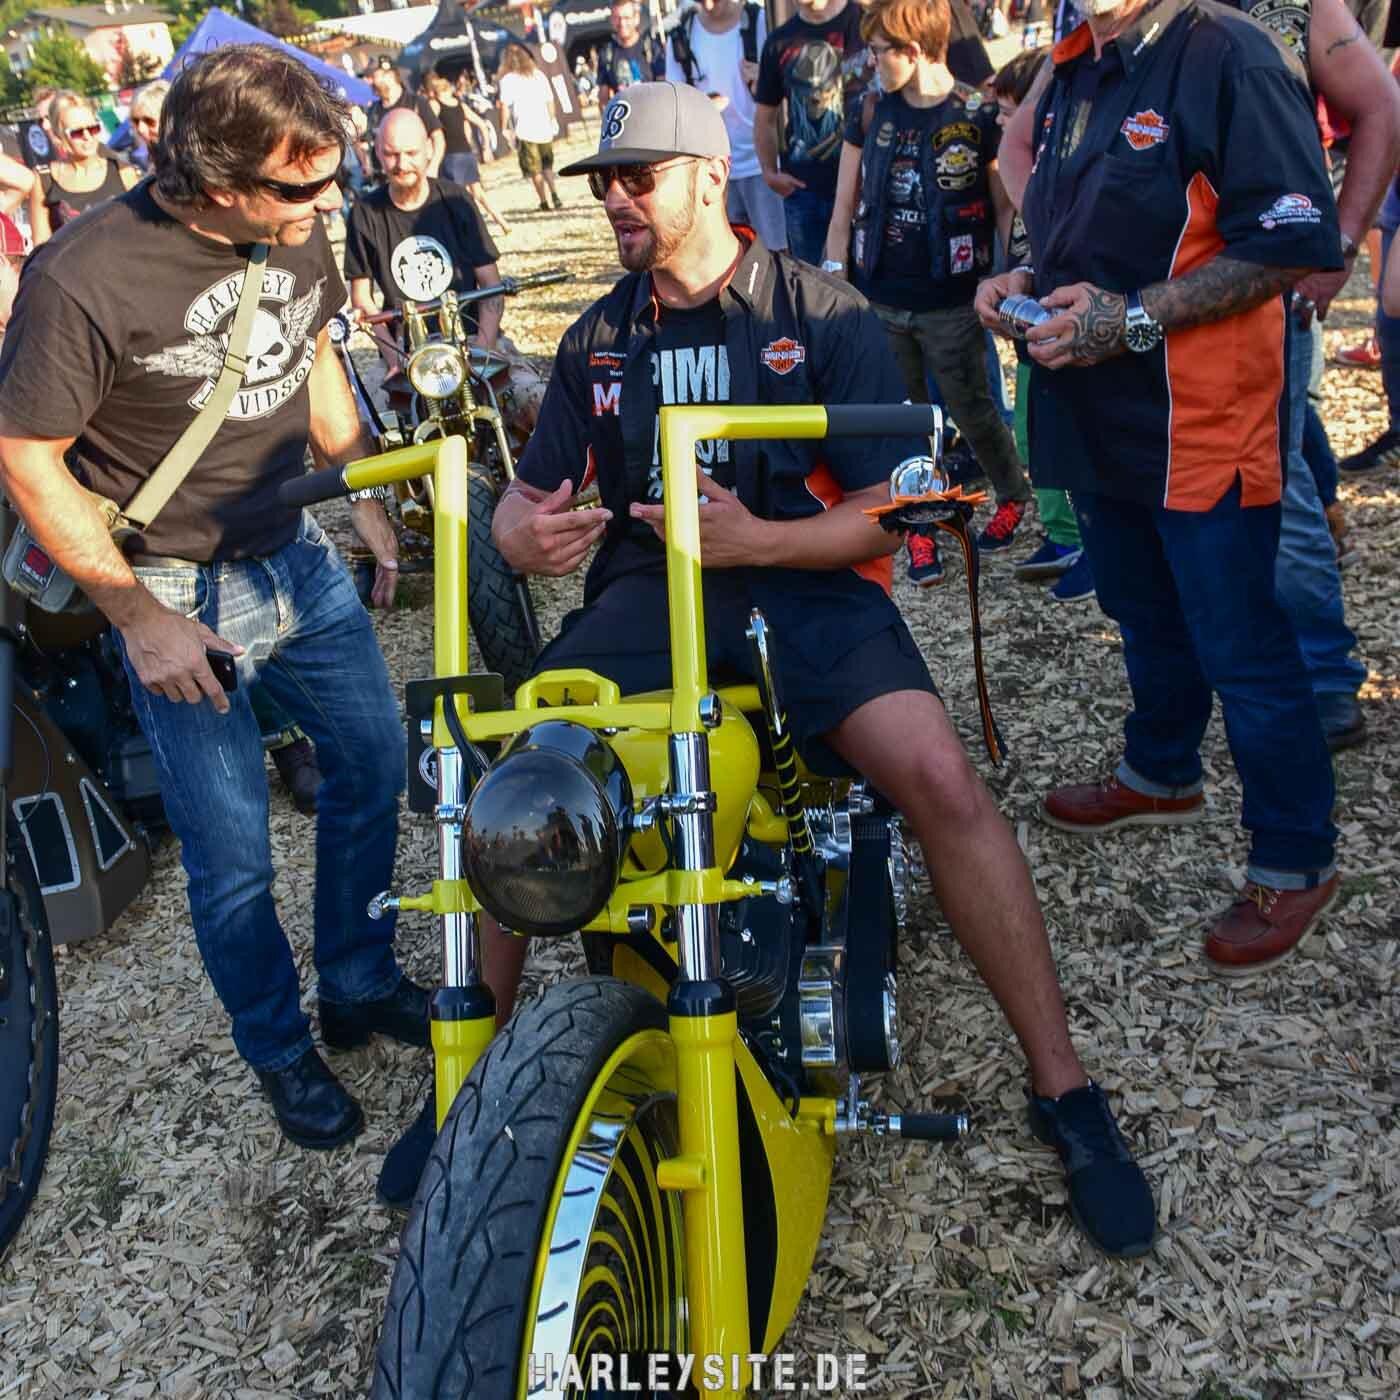 European-Bike-Week-0658